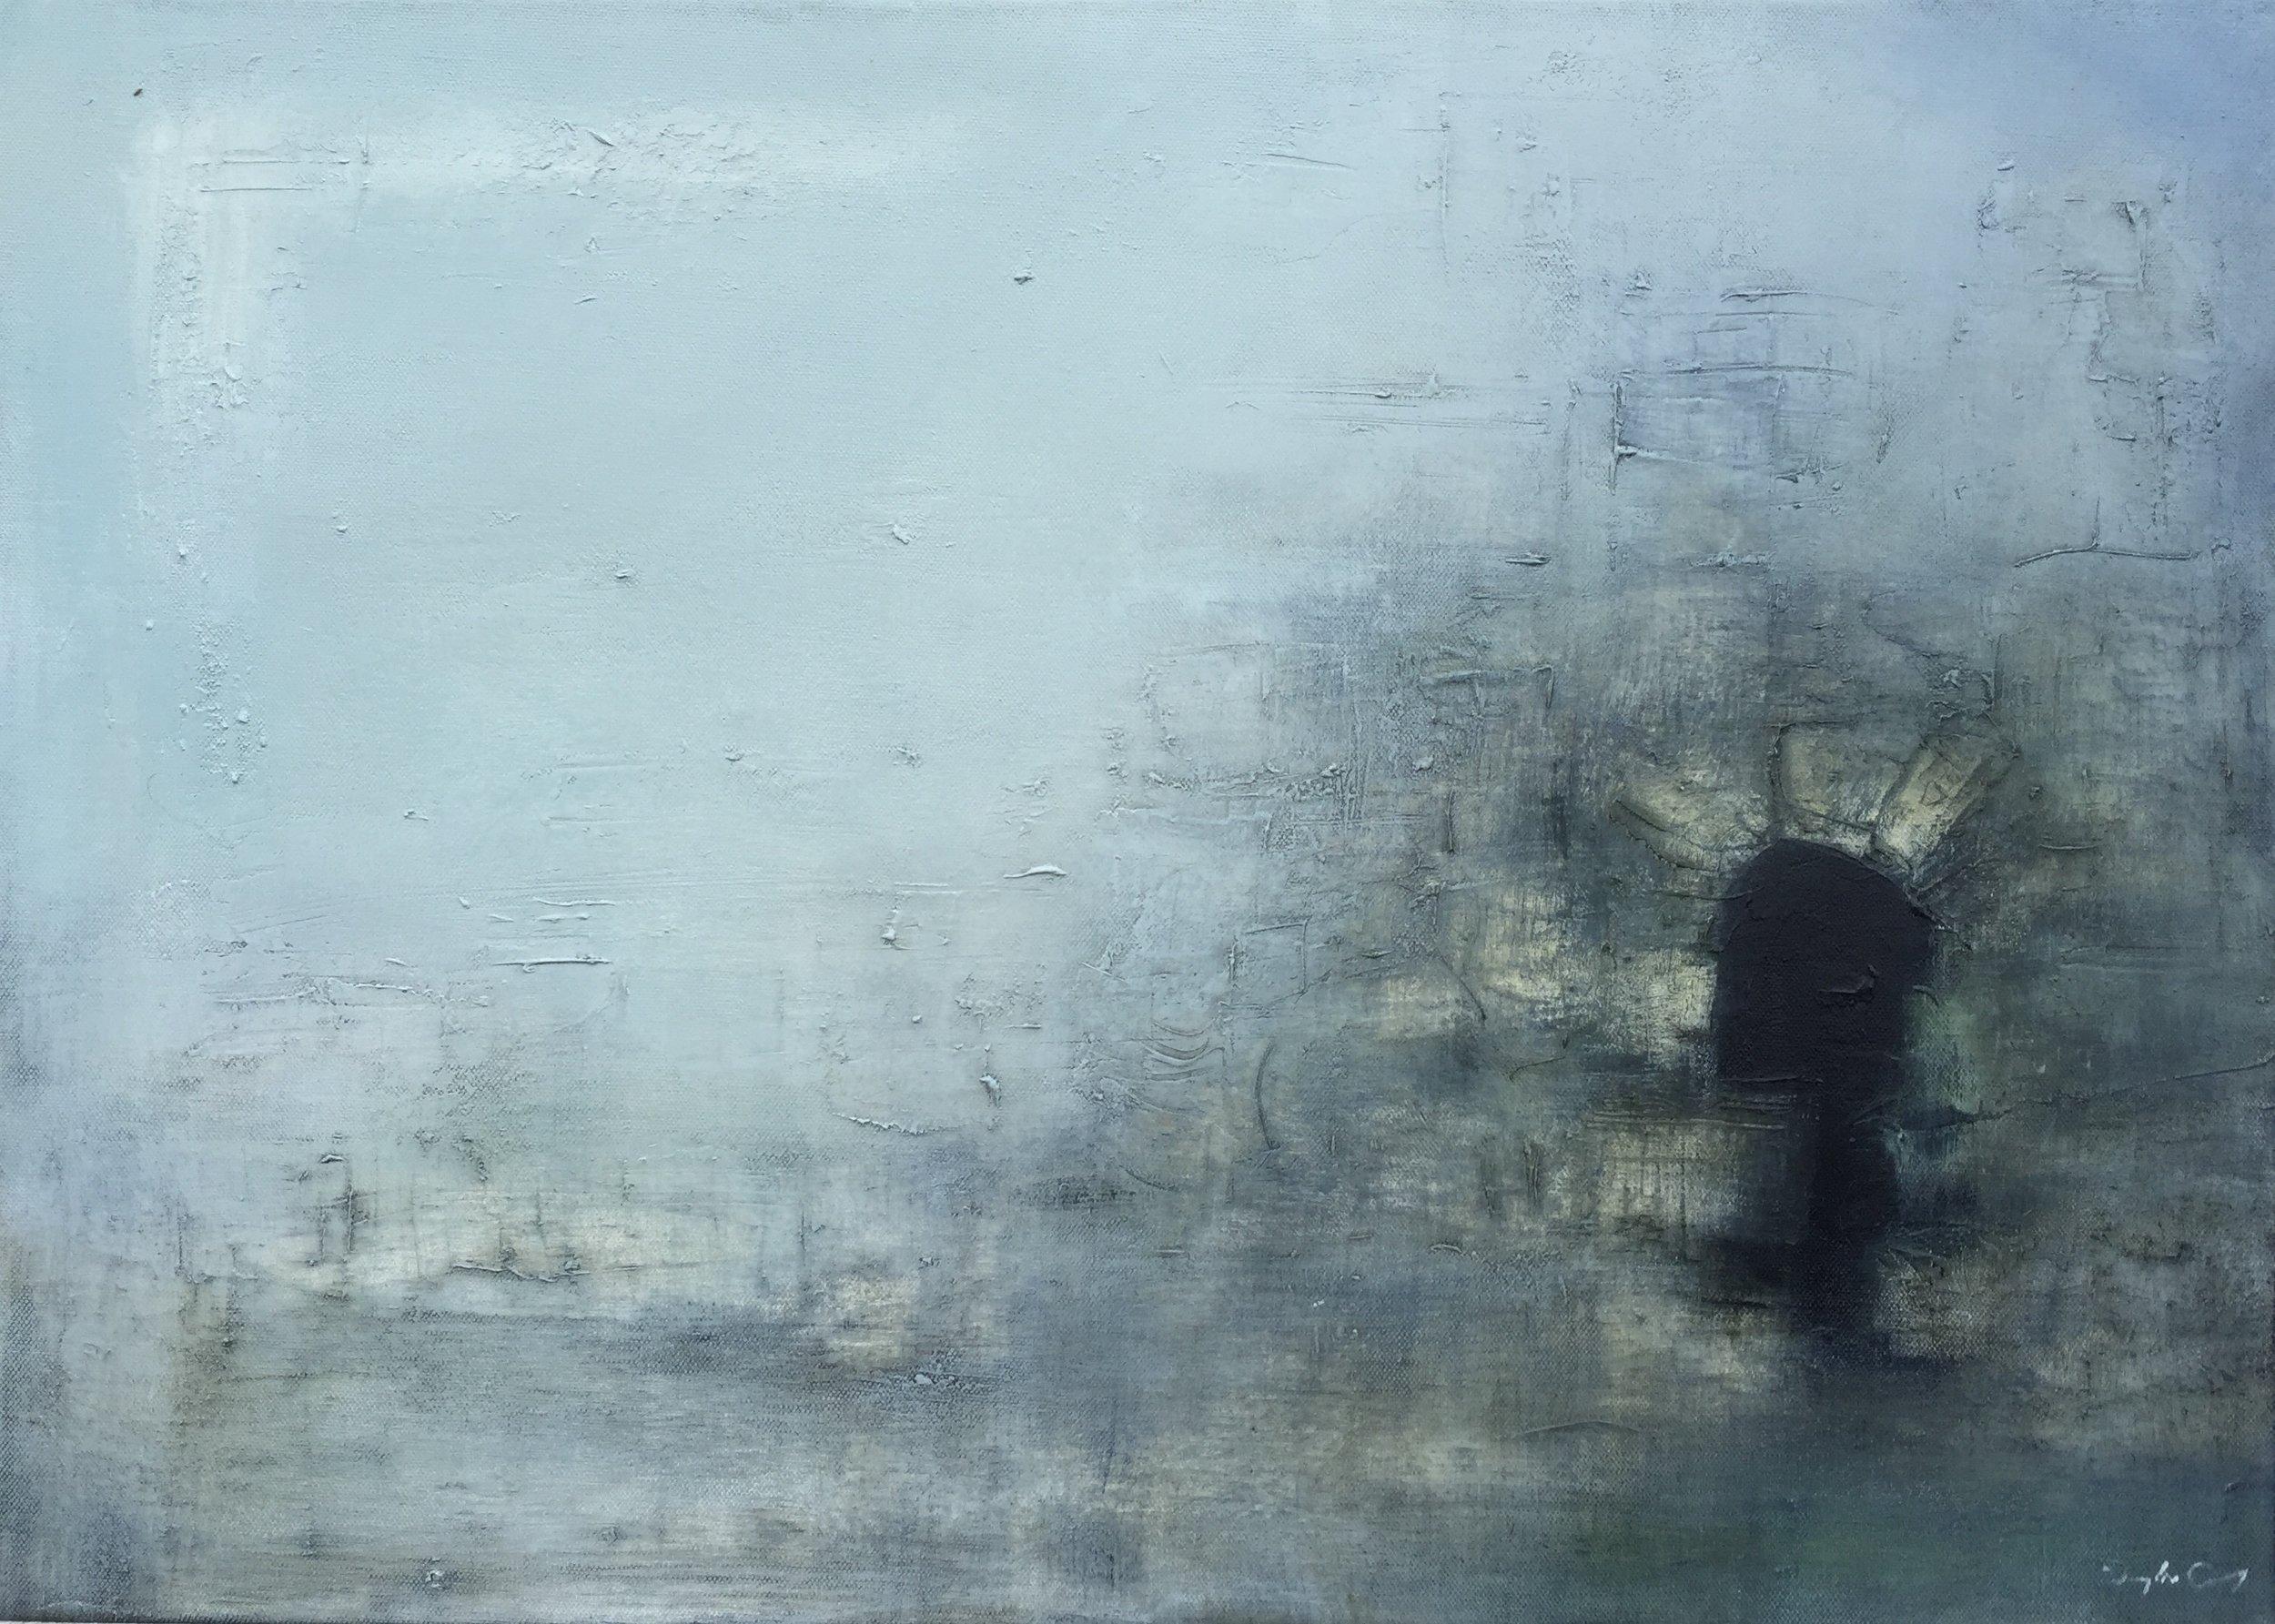 Last Bastion   oil on canvas, painting 50cm x 70cm, frame 55cm x 75cm, €sold